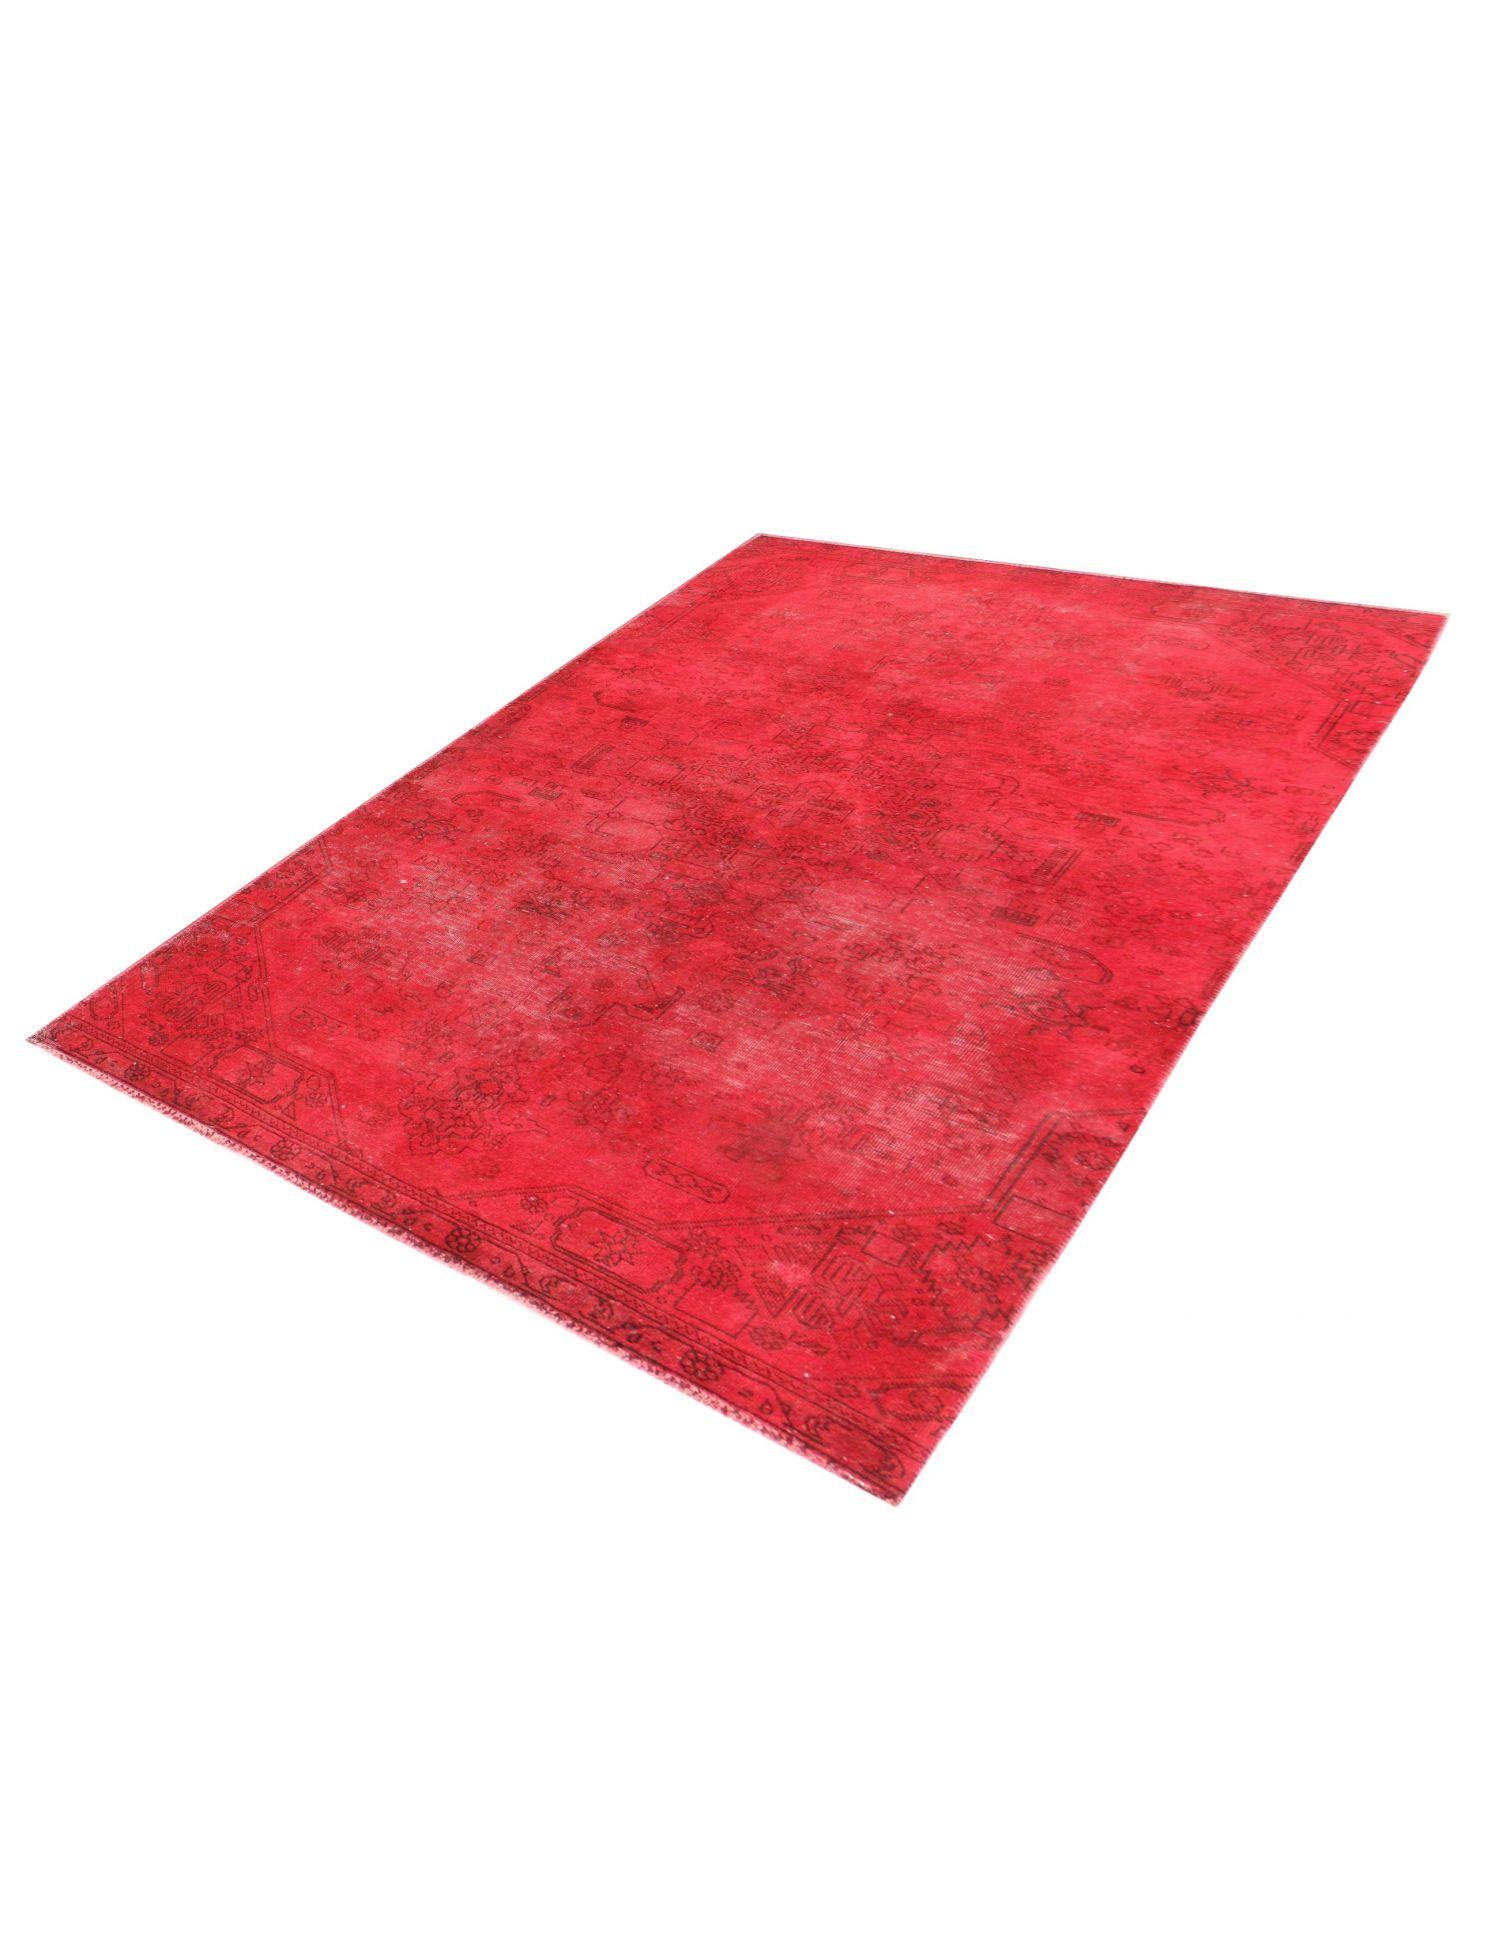 Vintage Teppich  rot <br/>230 x 124 cm